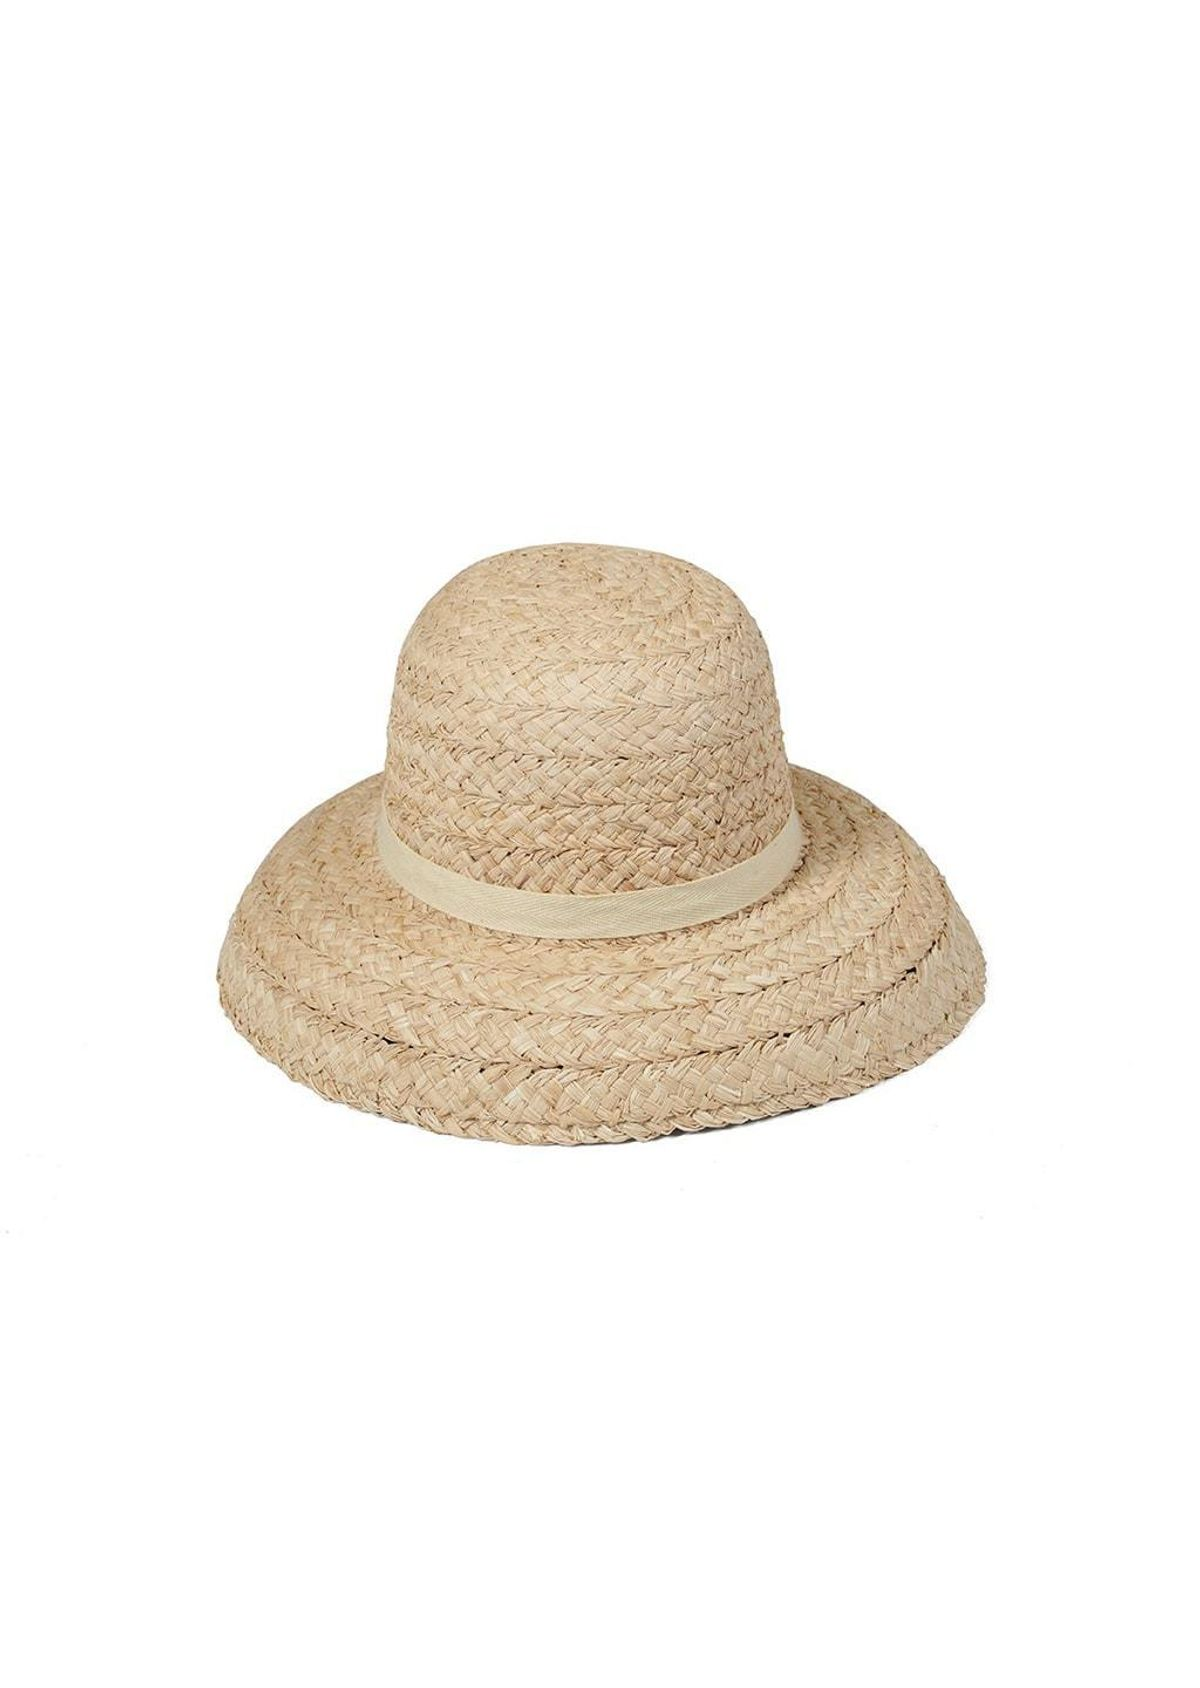 the beach people bloom raffia hat